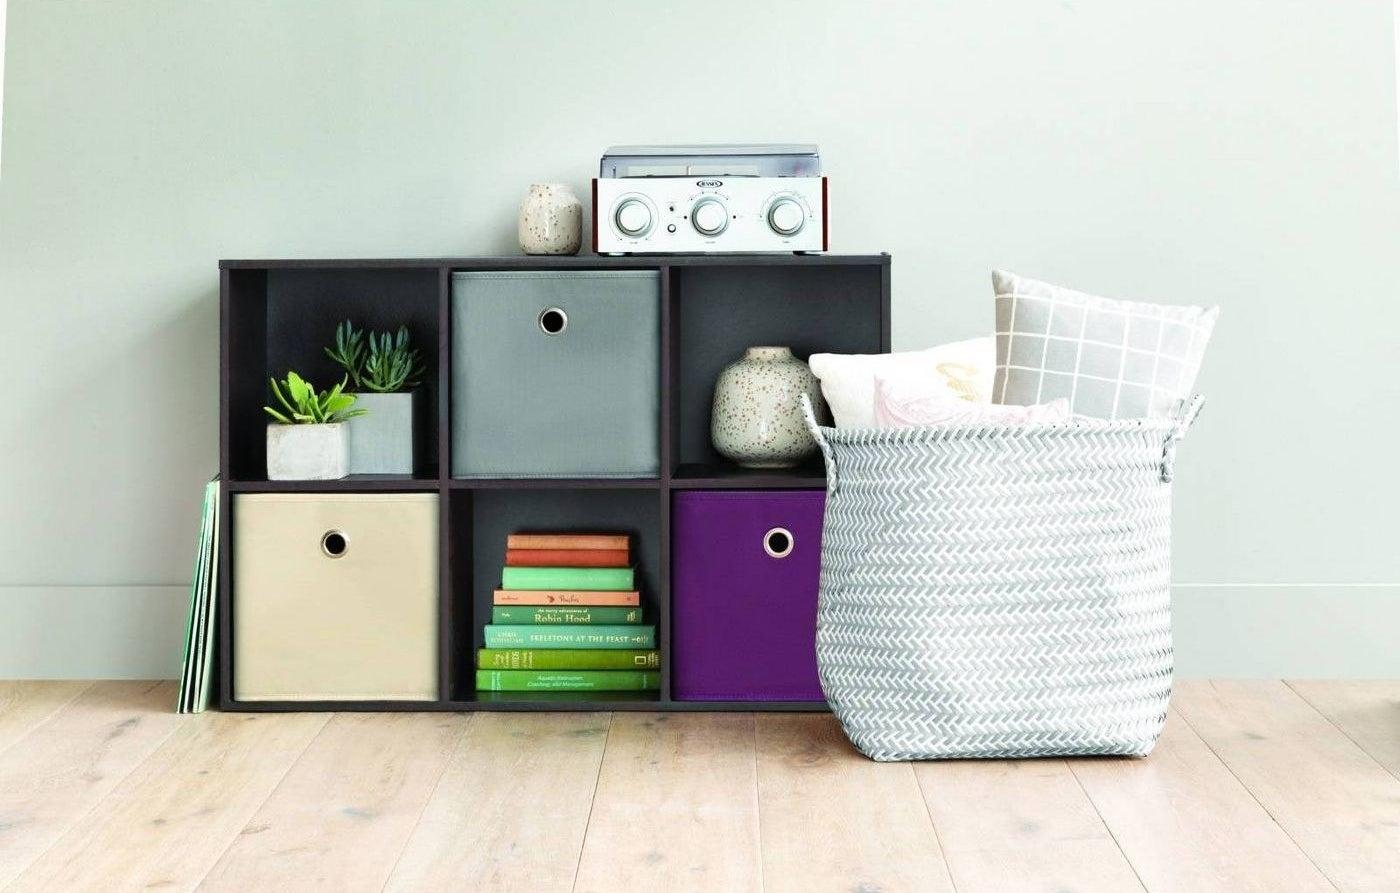 The 6-cube shelf organizer